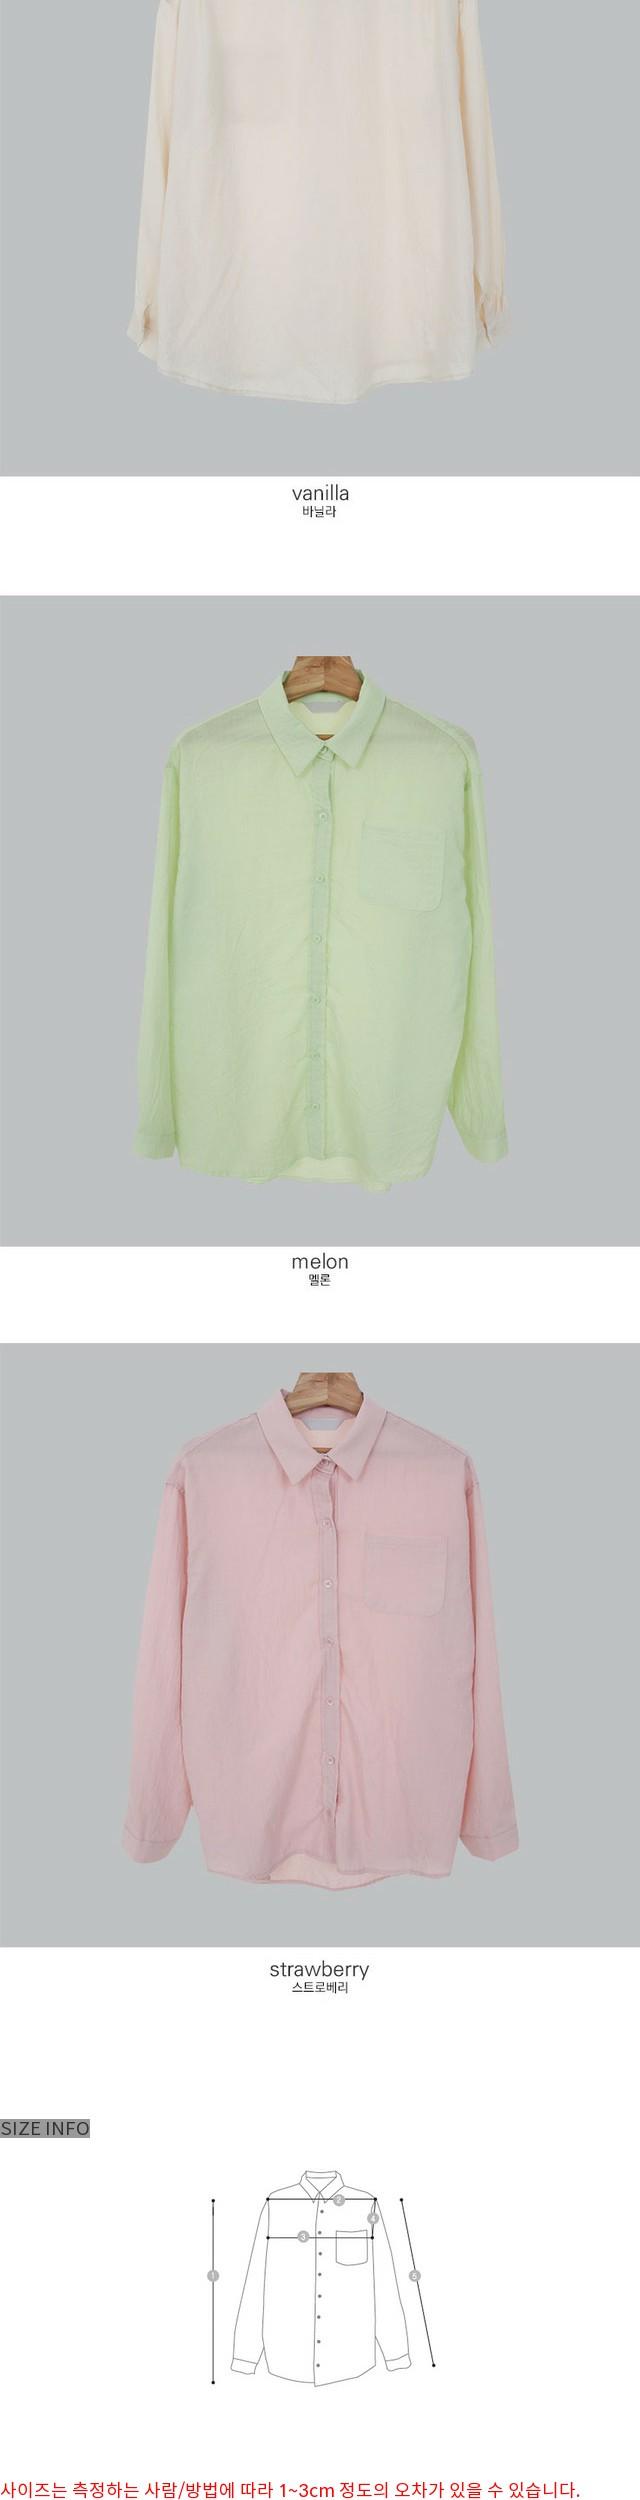 Icecream-shirt